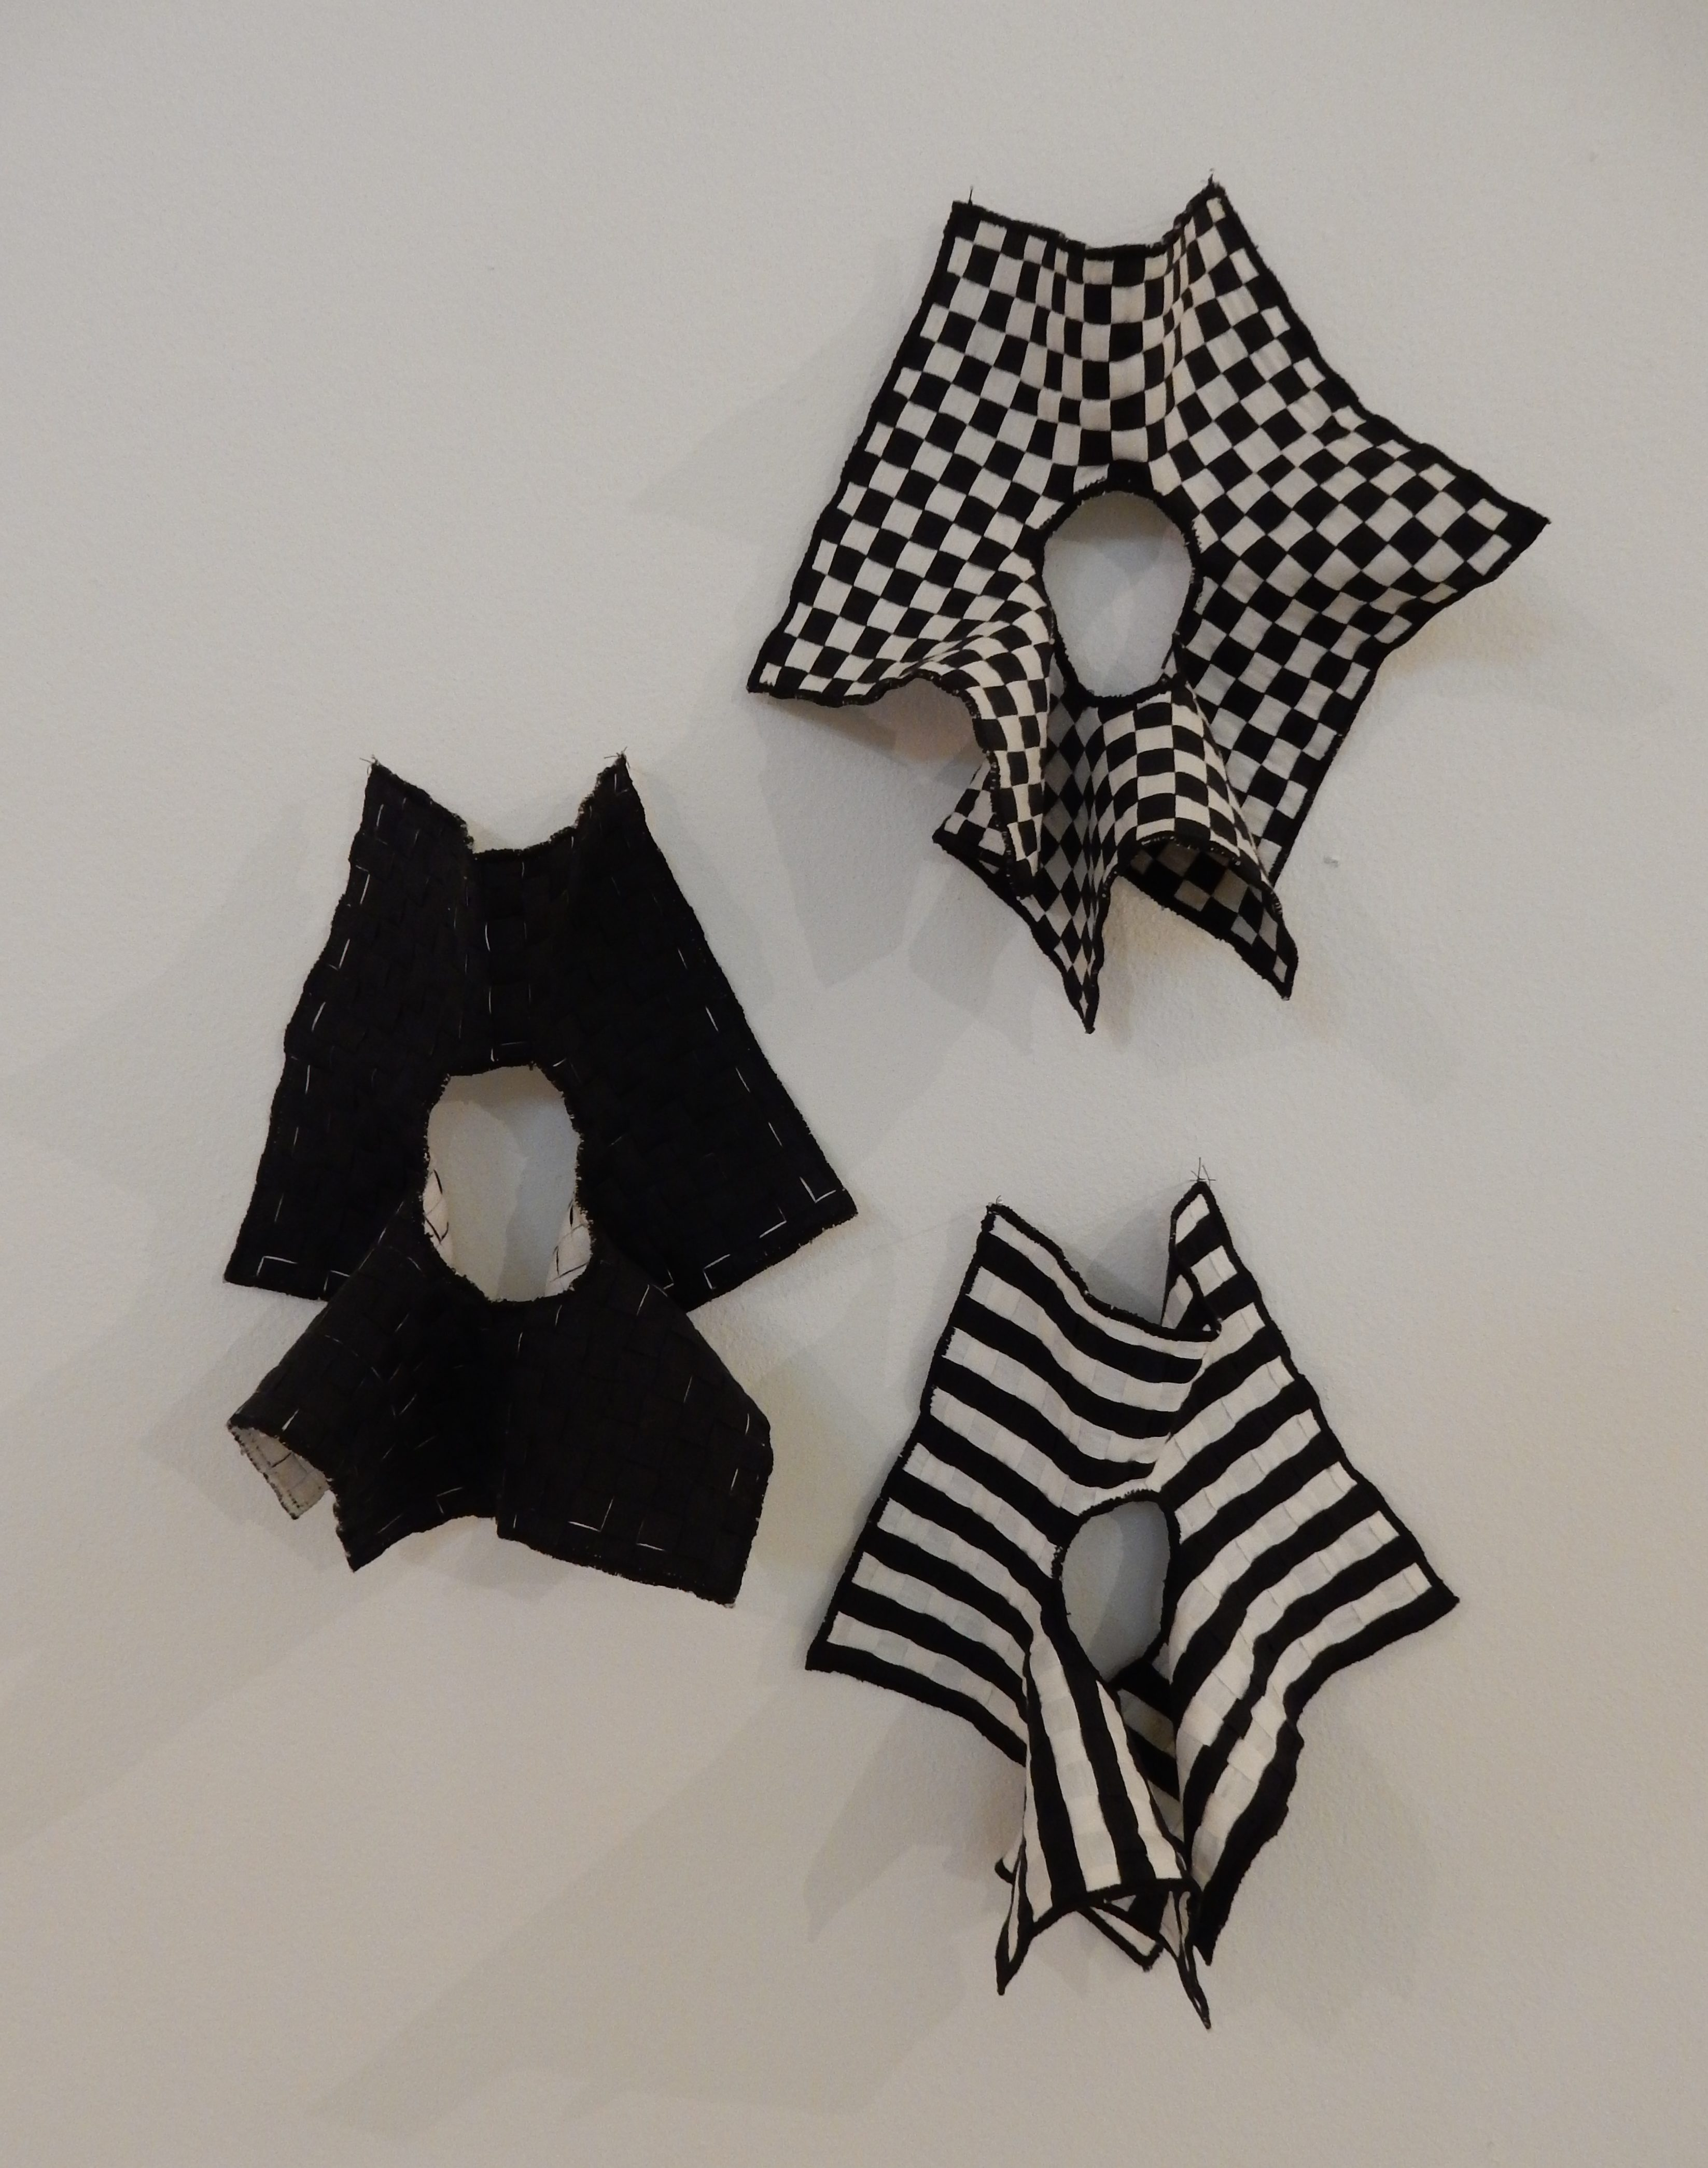 Caroline Broadhead, Handkerchief Bracelets. CODA, 2018. Foto Esther Doornbusch, CC BY 4.0